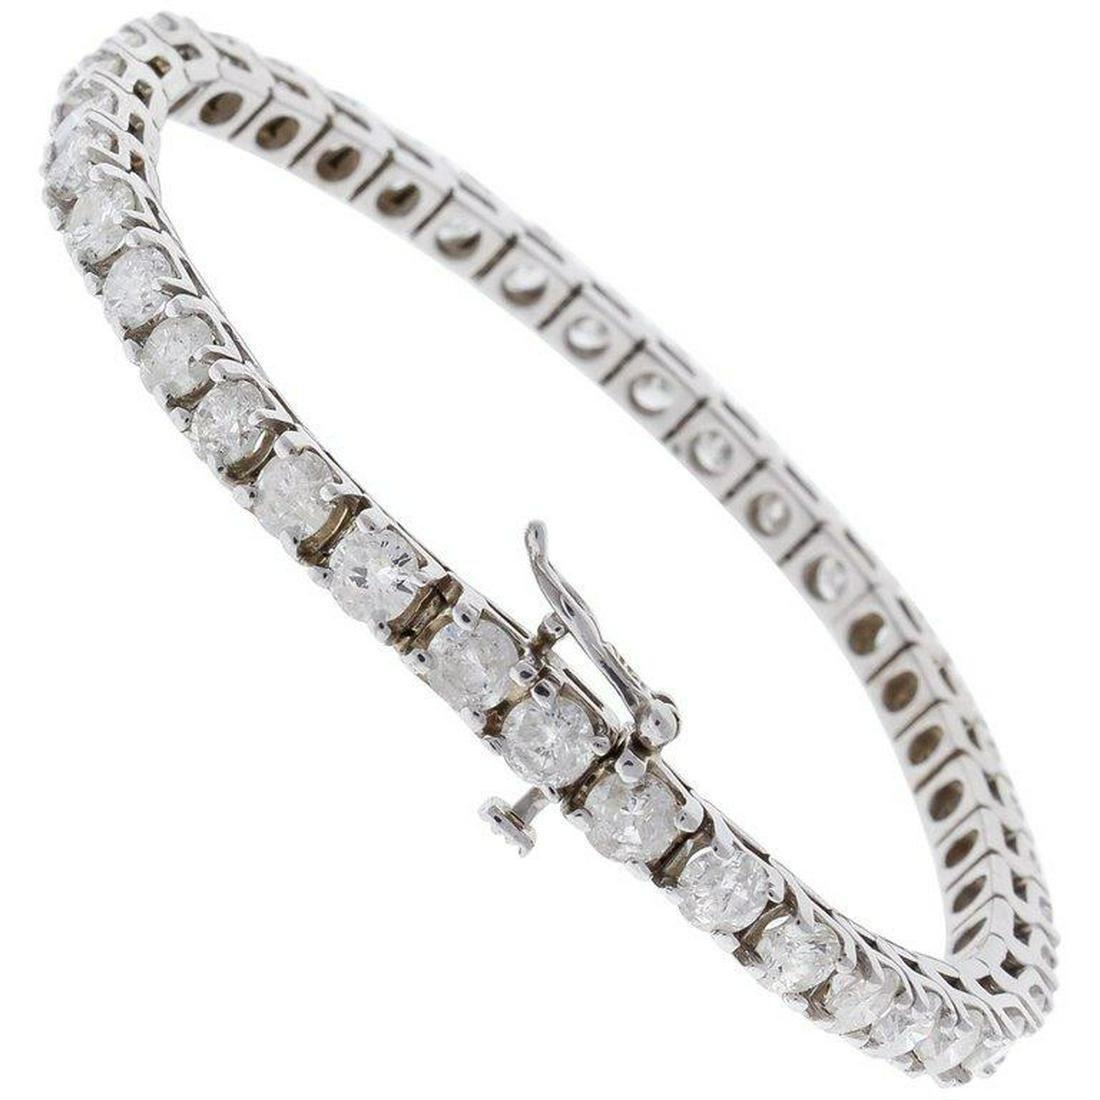 4.38 Carat Total Round Diamond 4 Prong Tennis Bracelet